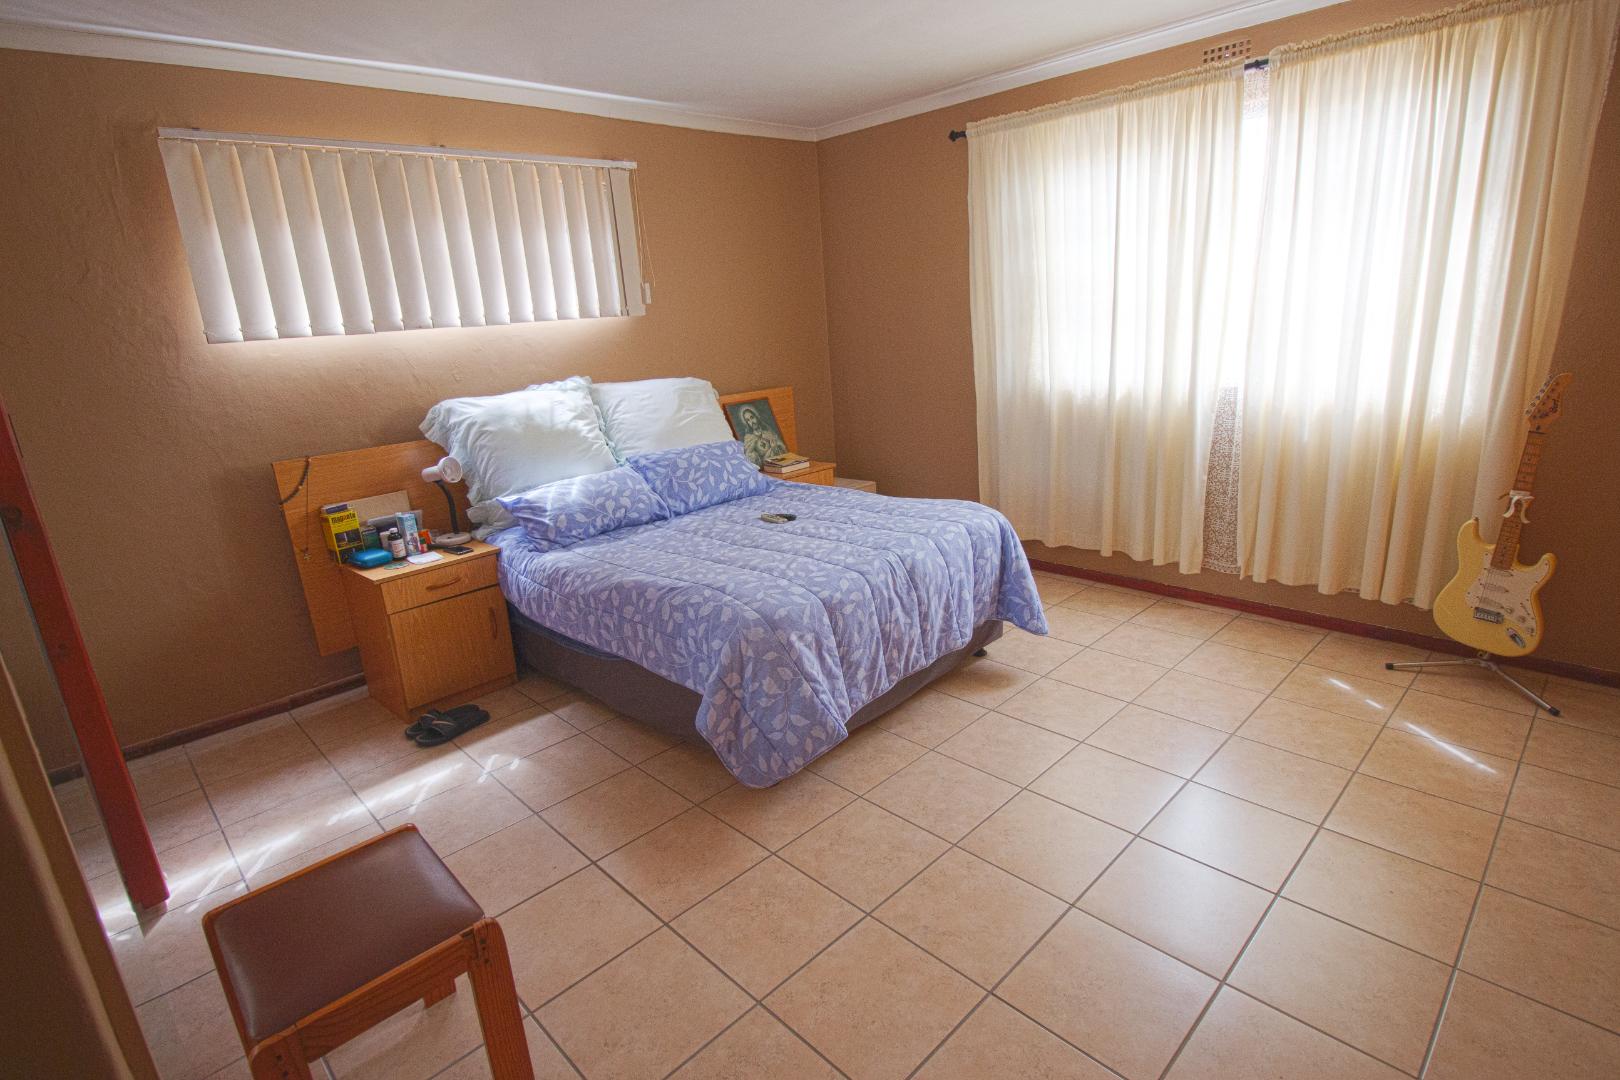 4 Bedroom House For Sale in Strandfontein